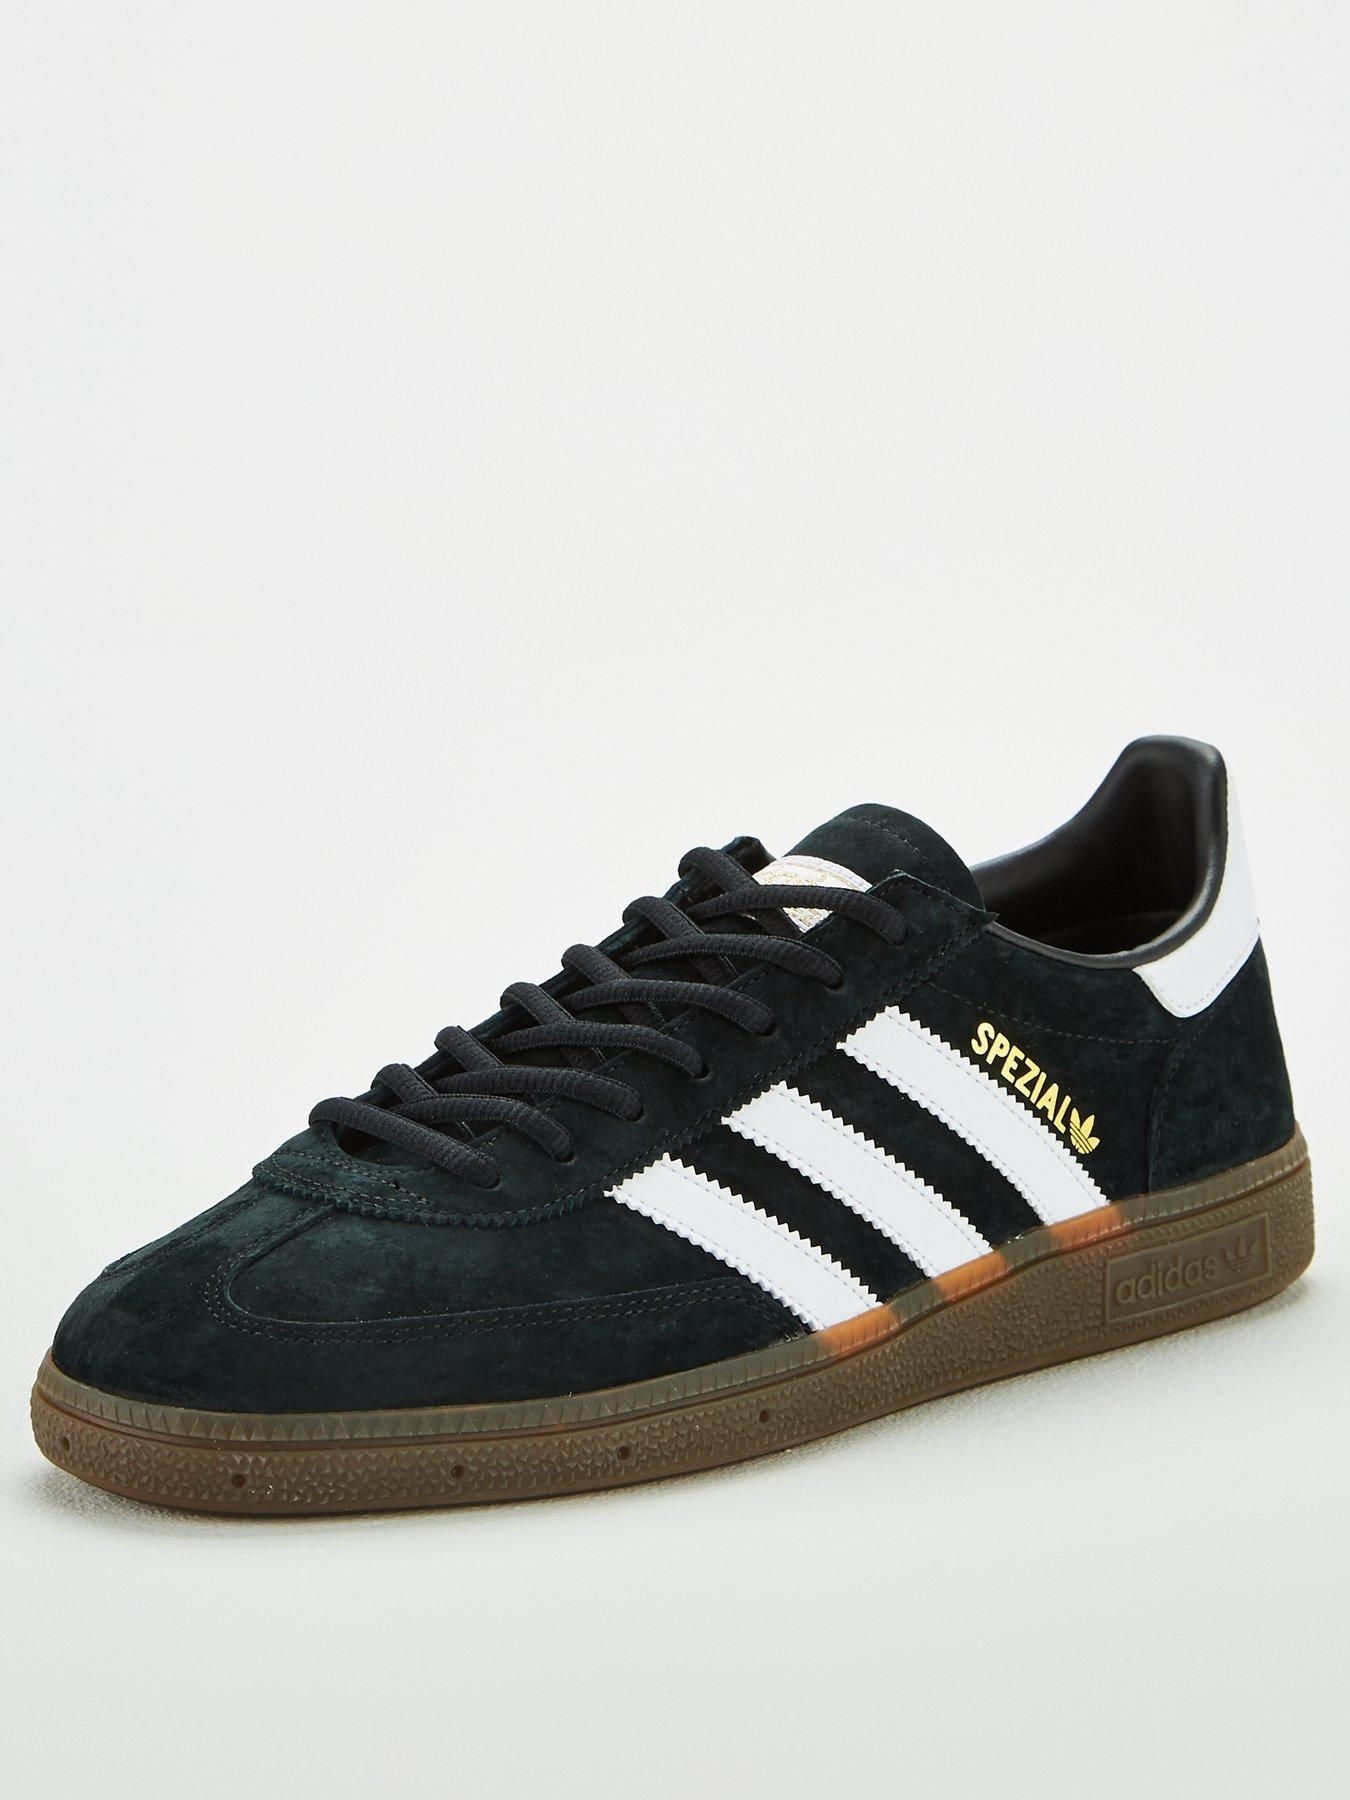 Adidas Originals Handball Spezial Black in BlackWhite